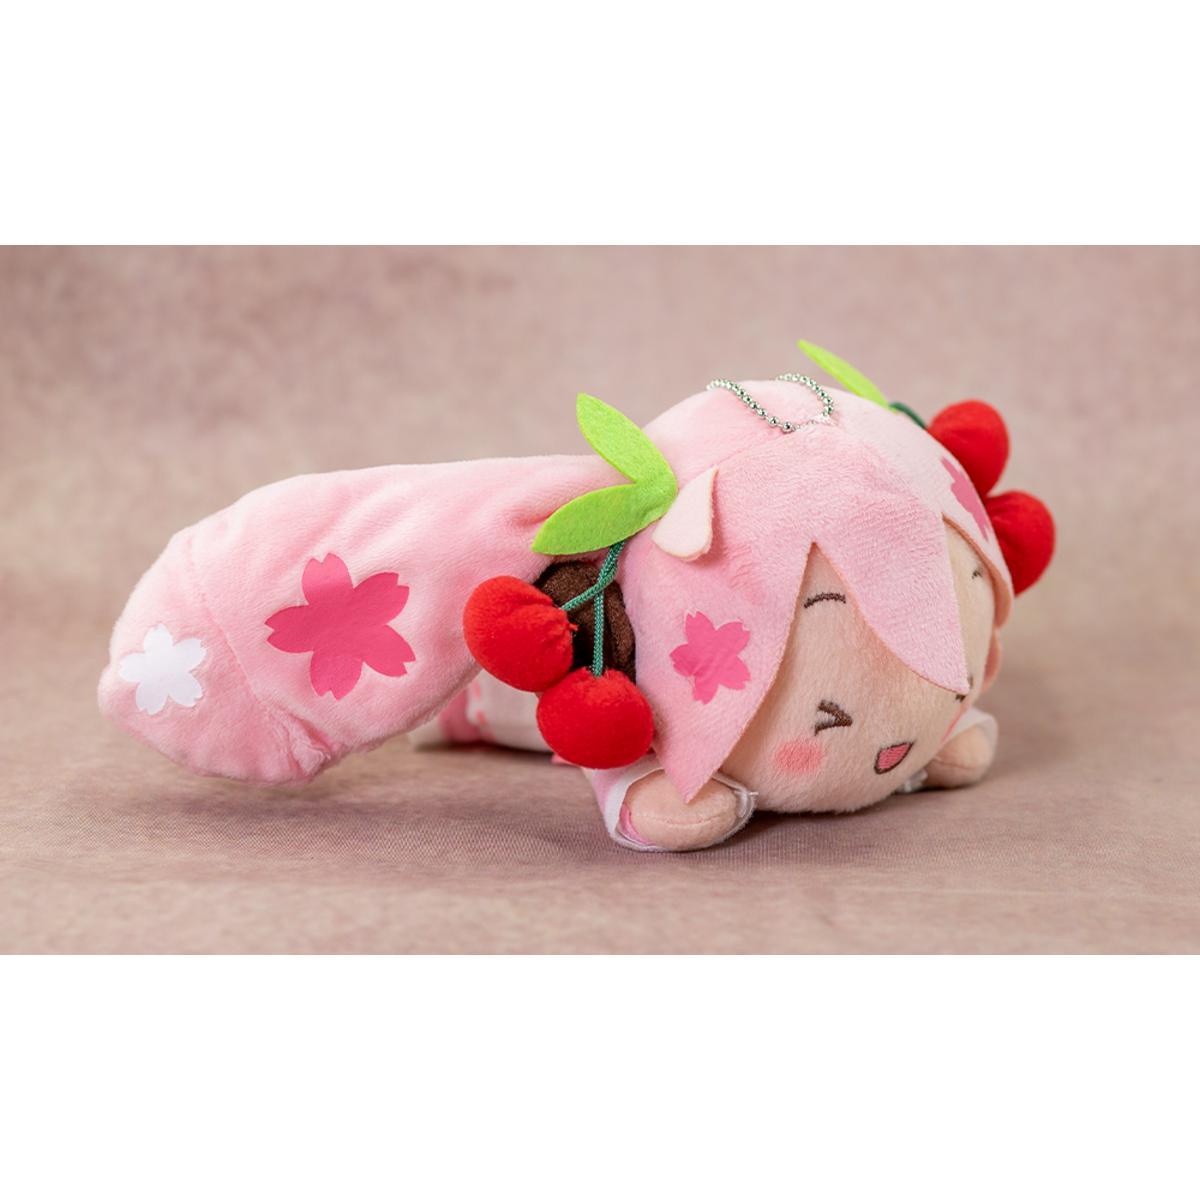 Sega Hatsune Miku Sakura Nesoberi Plush